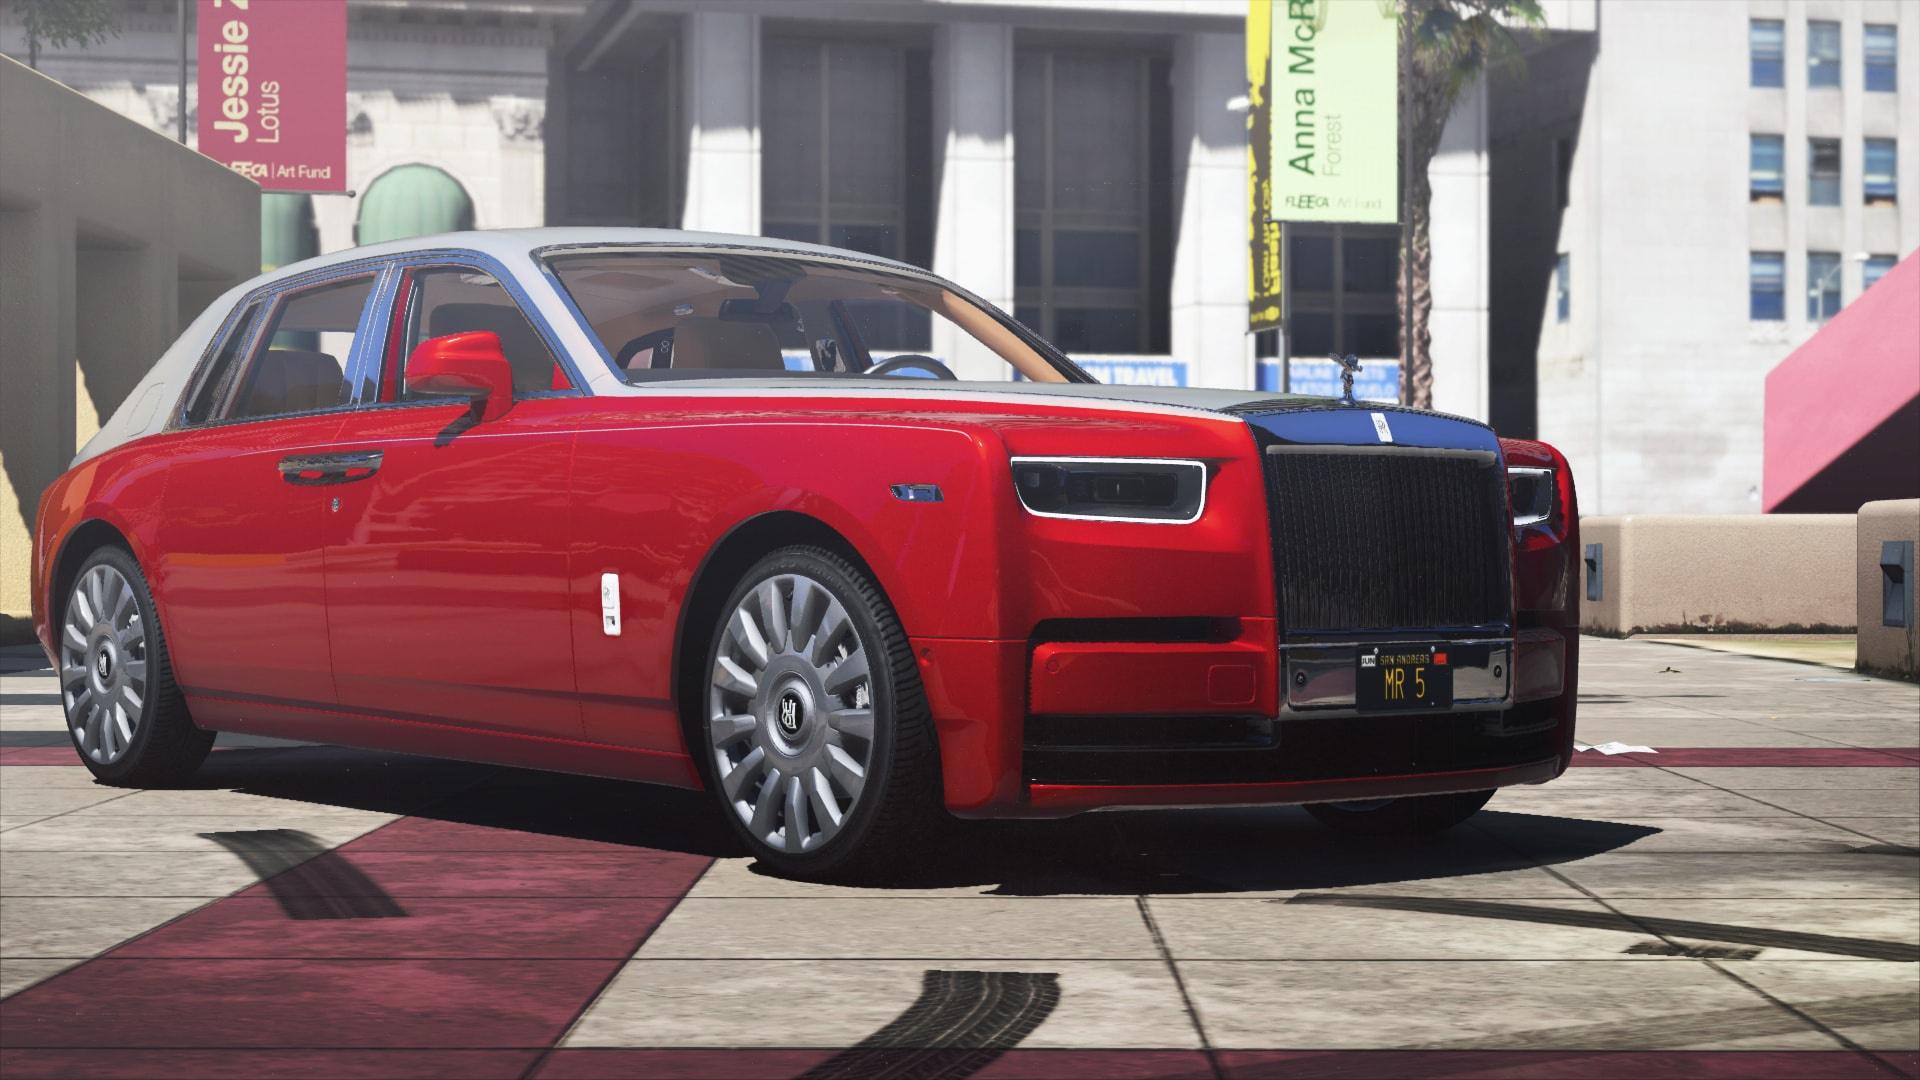 100 Rolls Royce Ghost Red Interior Rolls Royce Ghost Series Ii 2015 Pictures Information